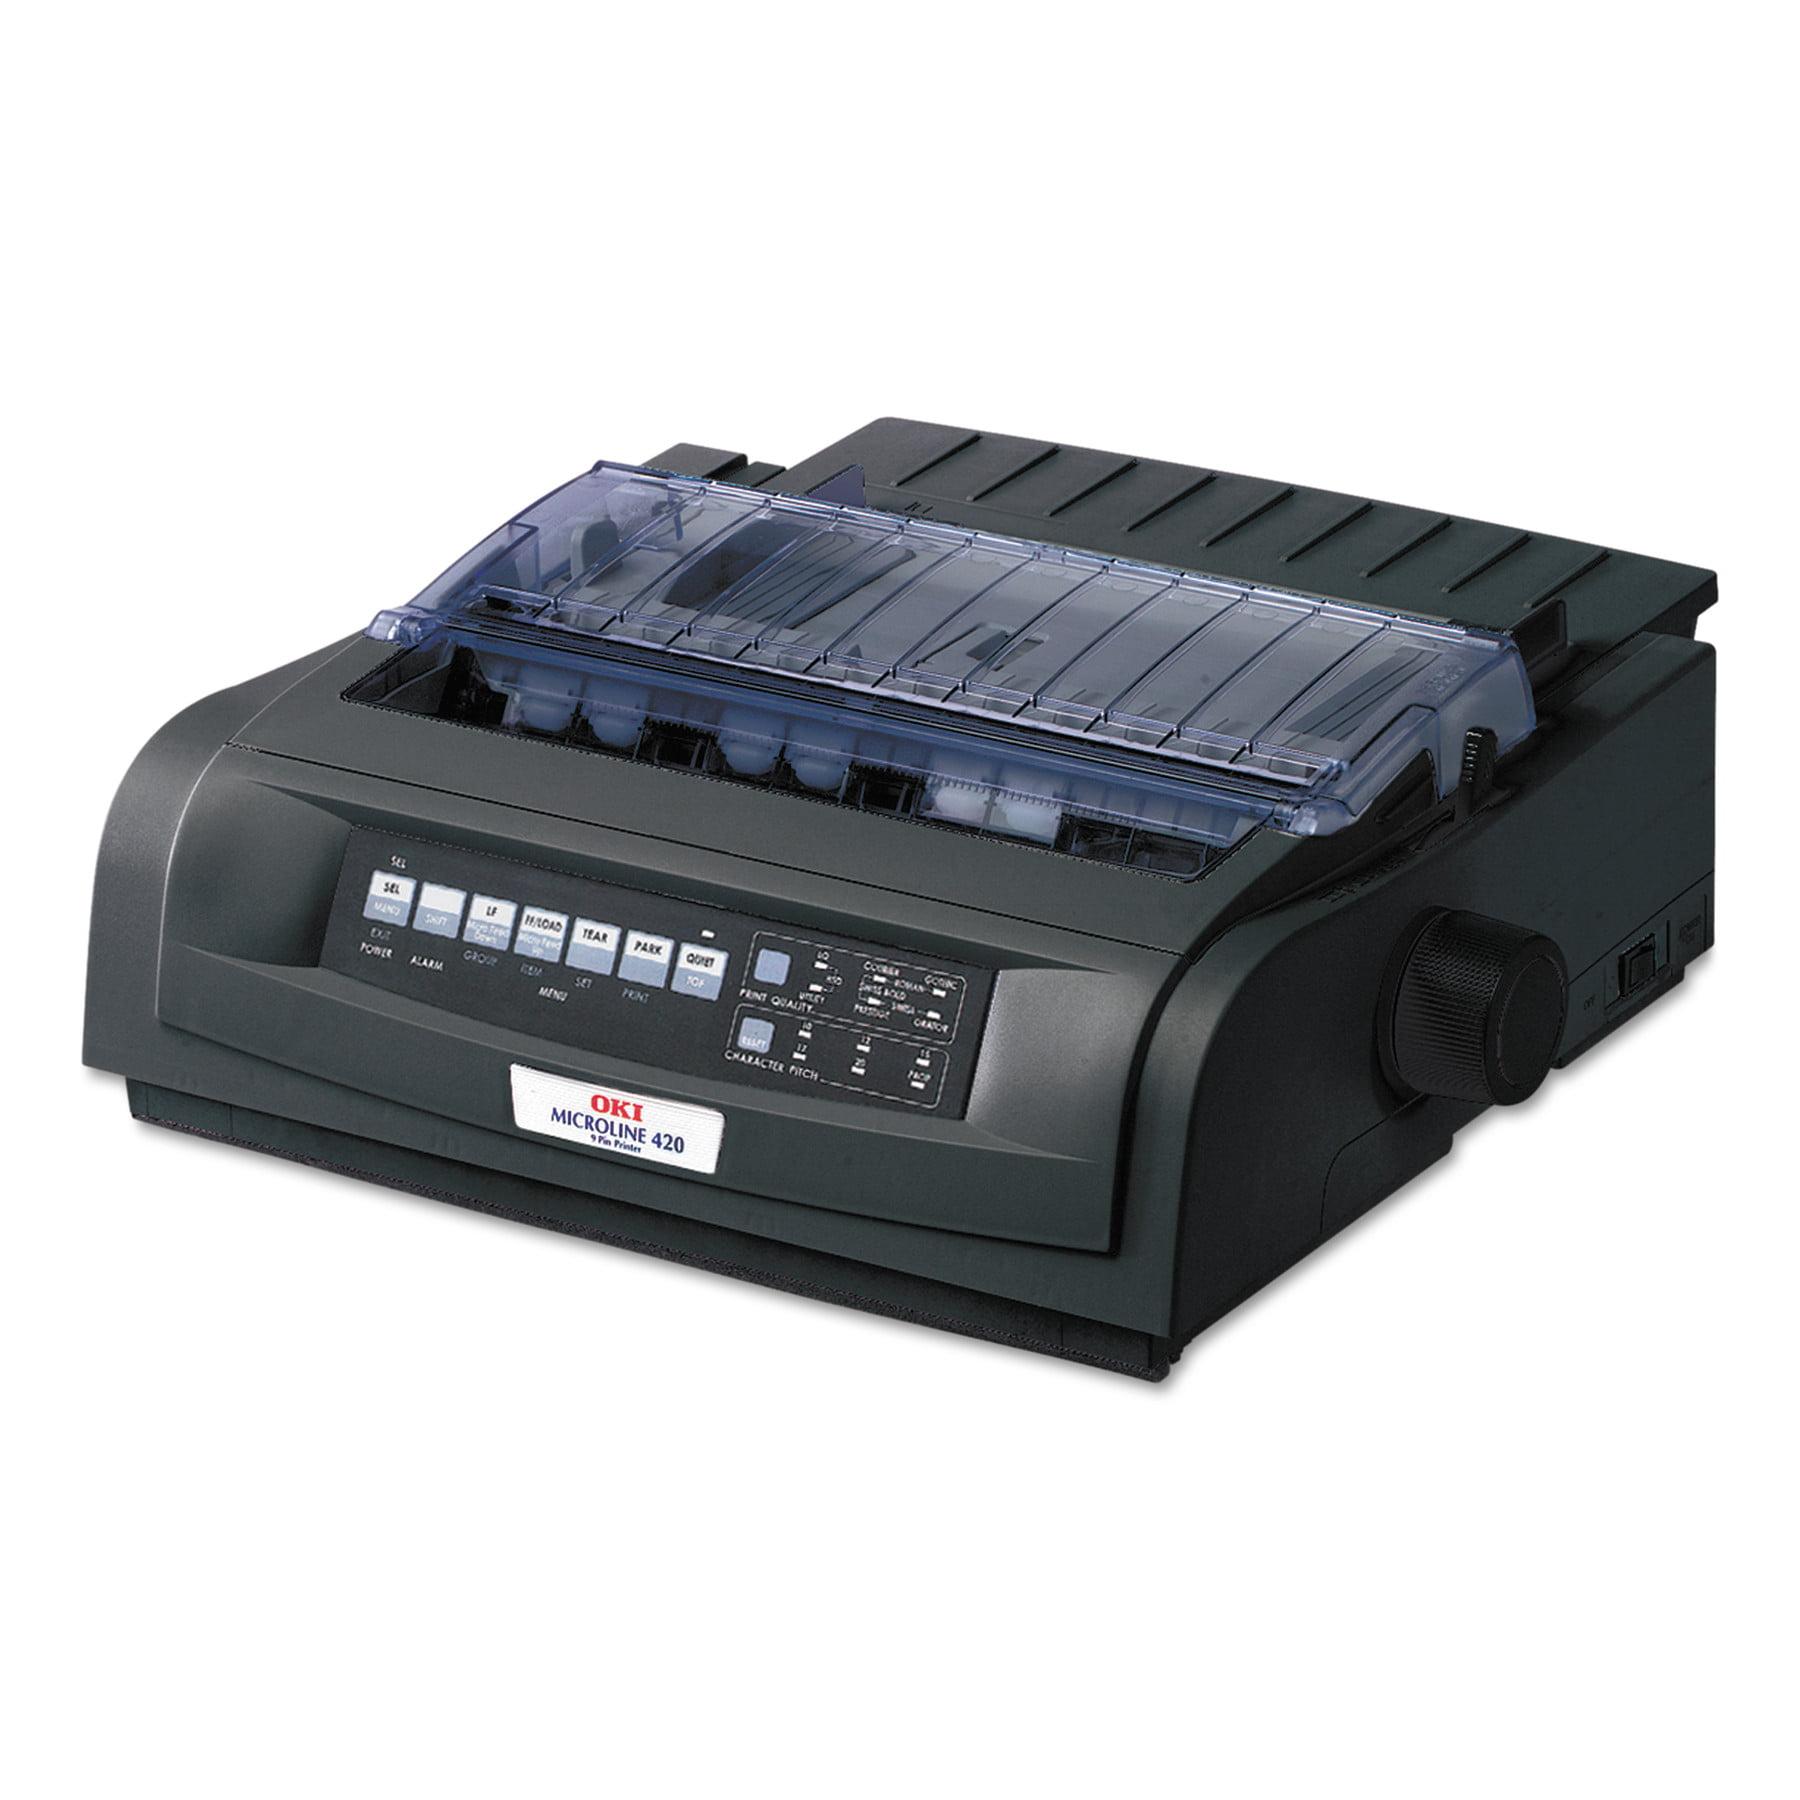 Oki Microline 420 Serial Narrow-Carriage 9-Pin Dot Matrix Printer